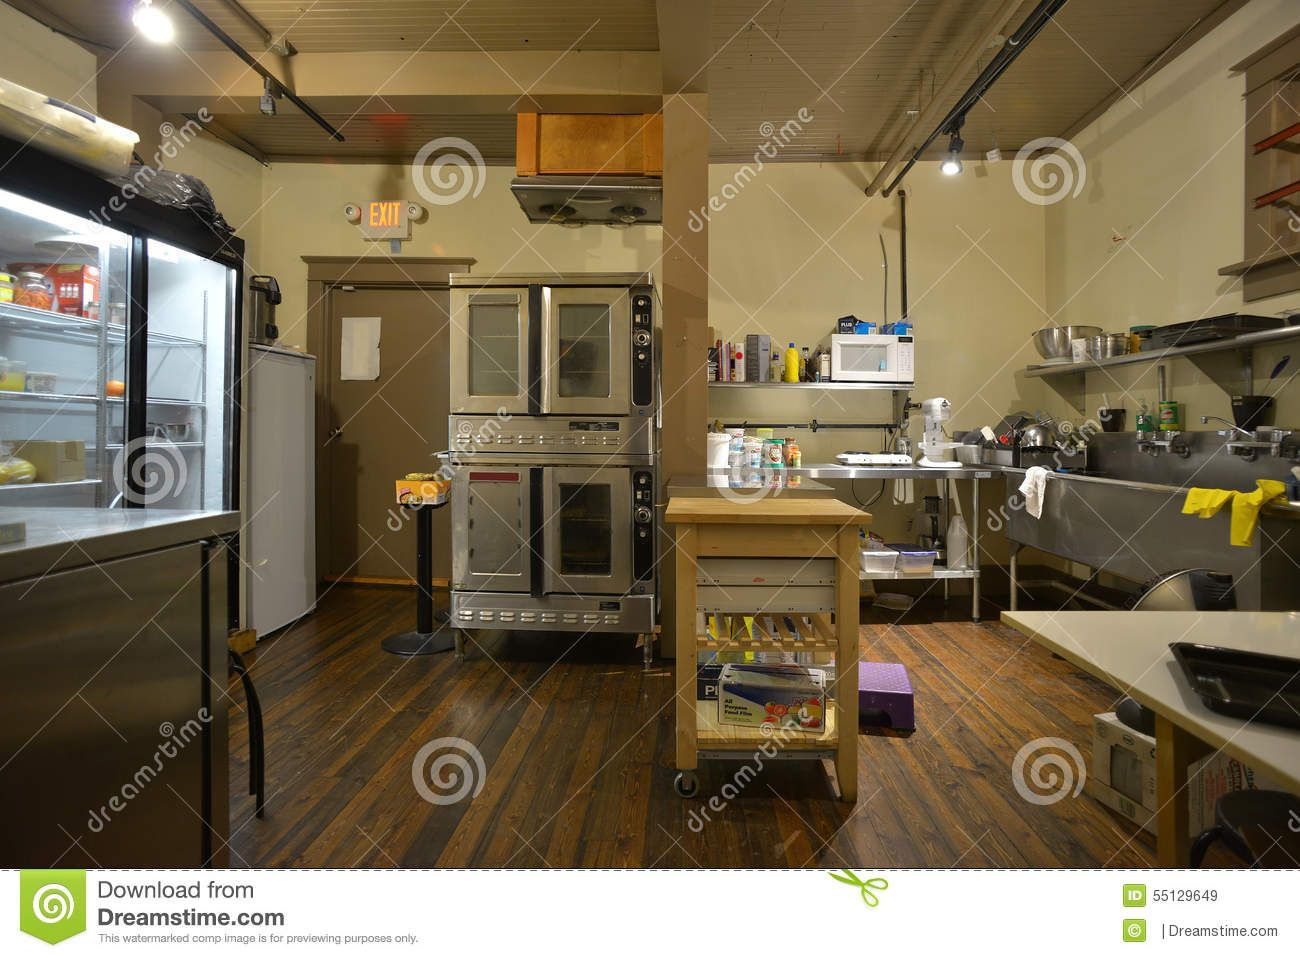 Image Result For Home Bakery Design | Vision | Pinterest | Bakery Design